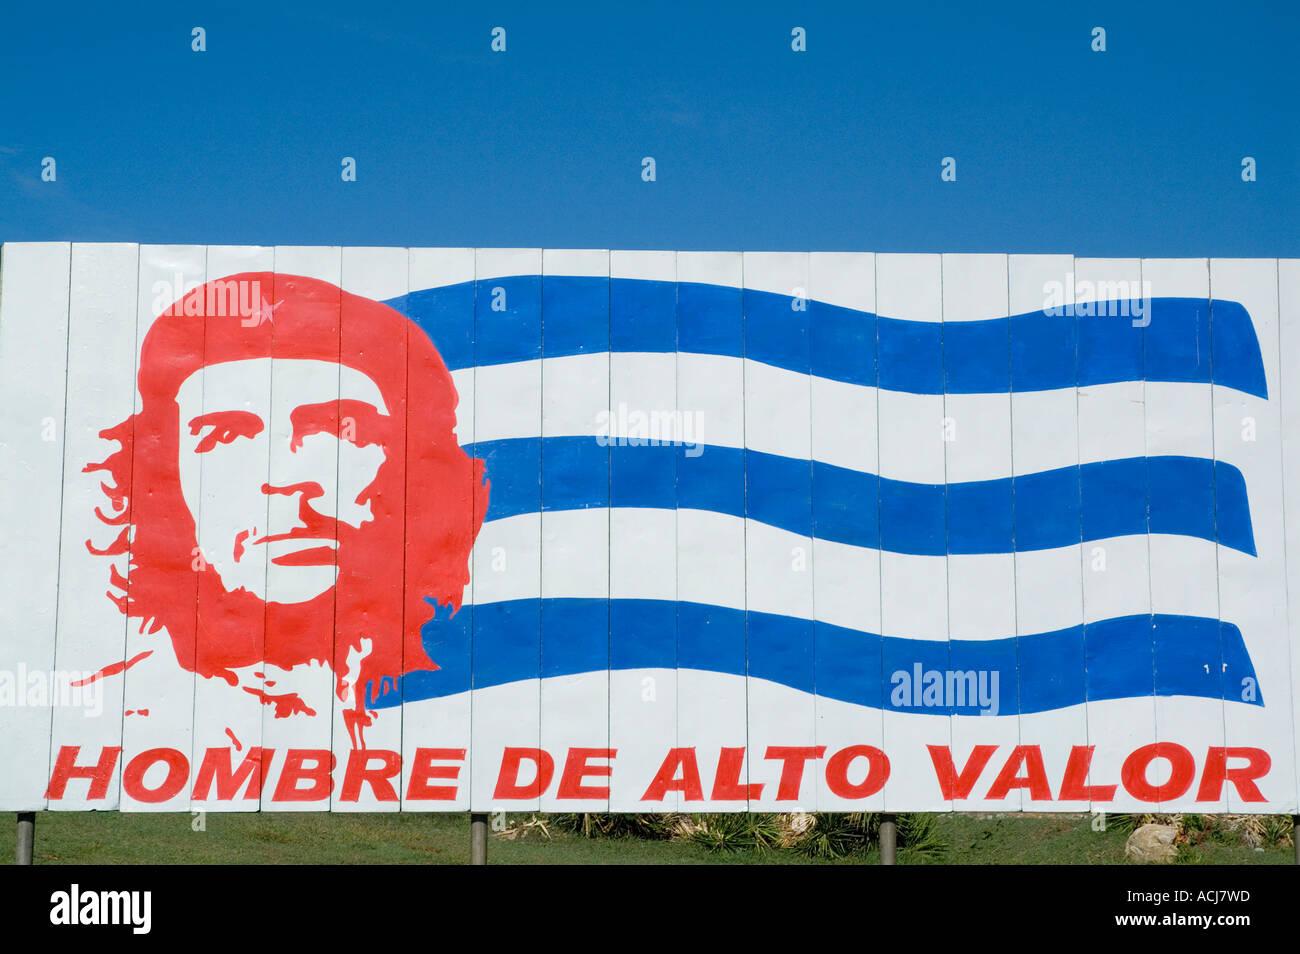 Plakat mit dem legendären Che Guevara Porträt und kubanischen Nationalflagge, Trinidad, Kuba. Stockbild